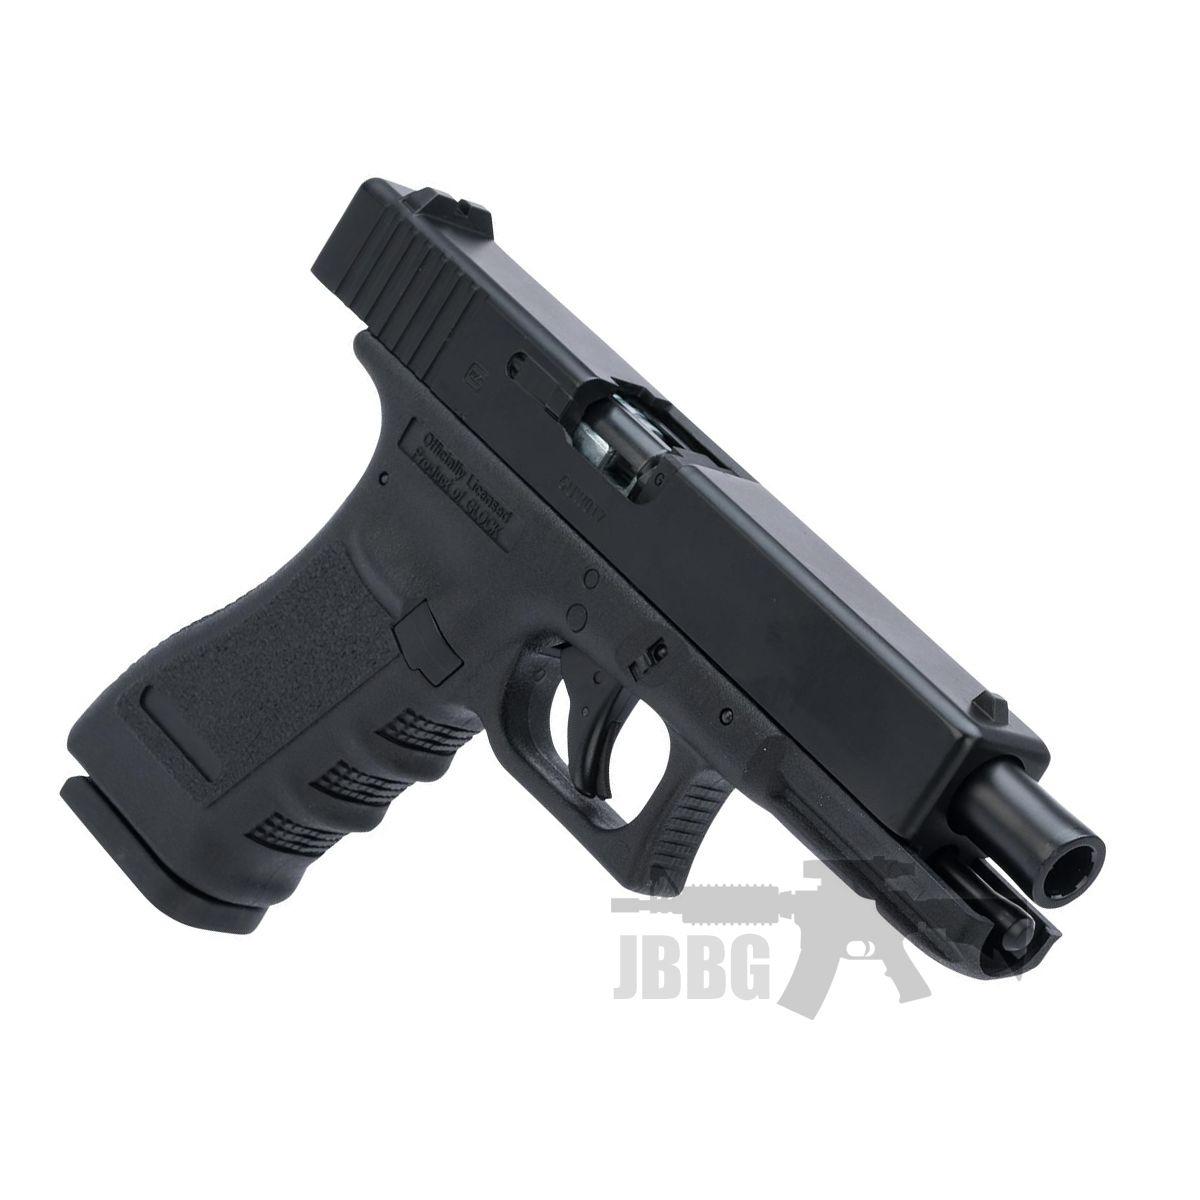 Glock G17 GEN 3 Co2 Blowback Airsoft Pistol